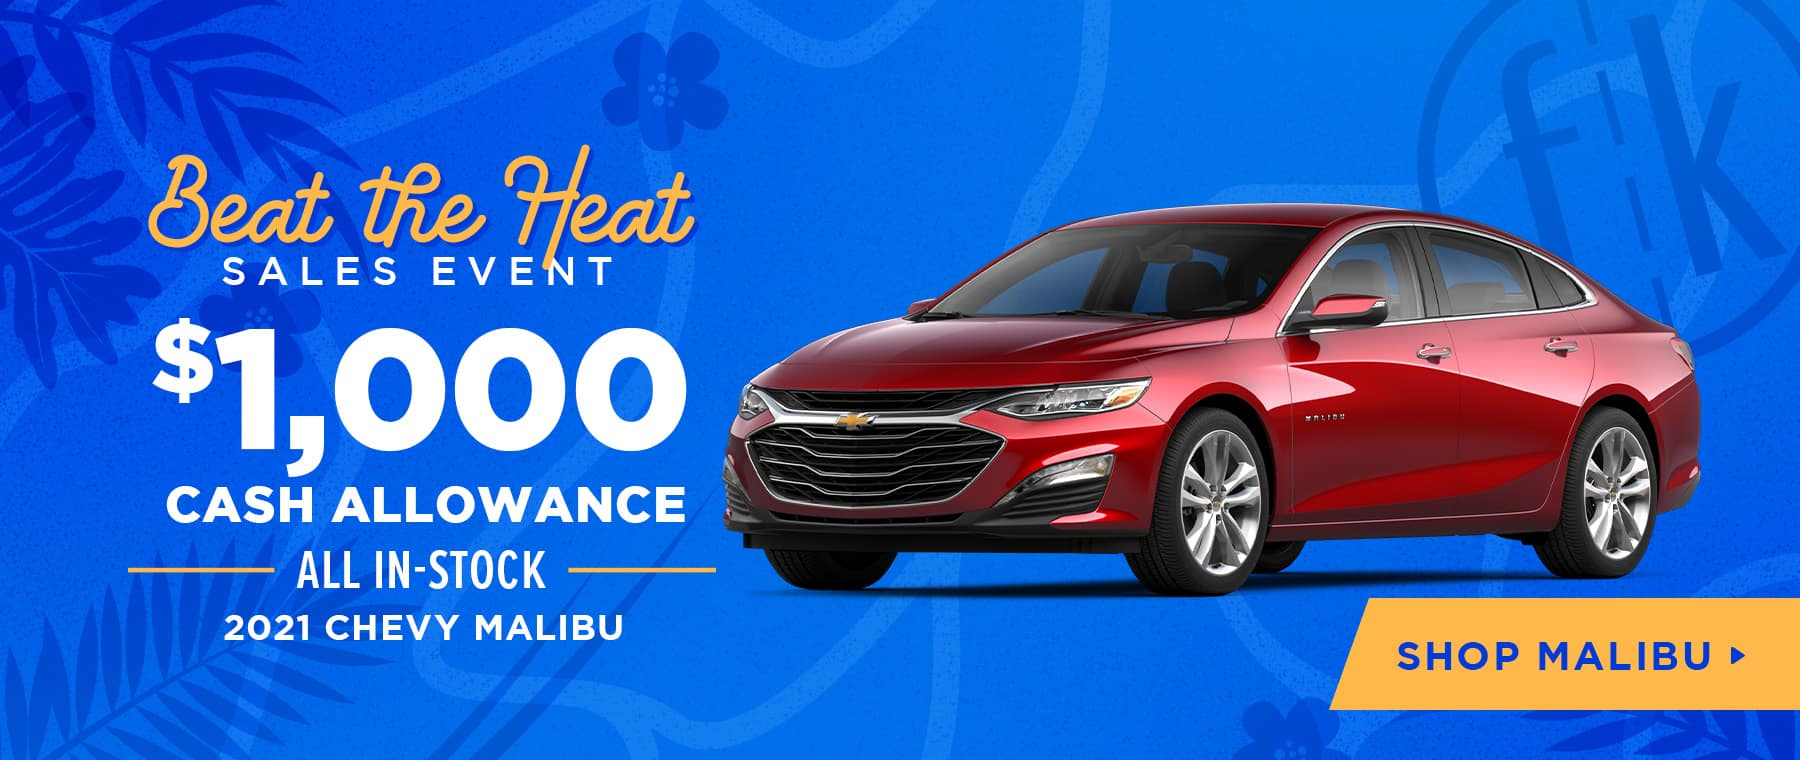 $1,000 Cash Allowance All In-Stock 2021 Chevy Malibu